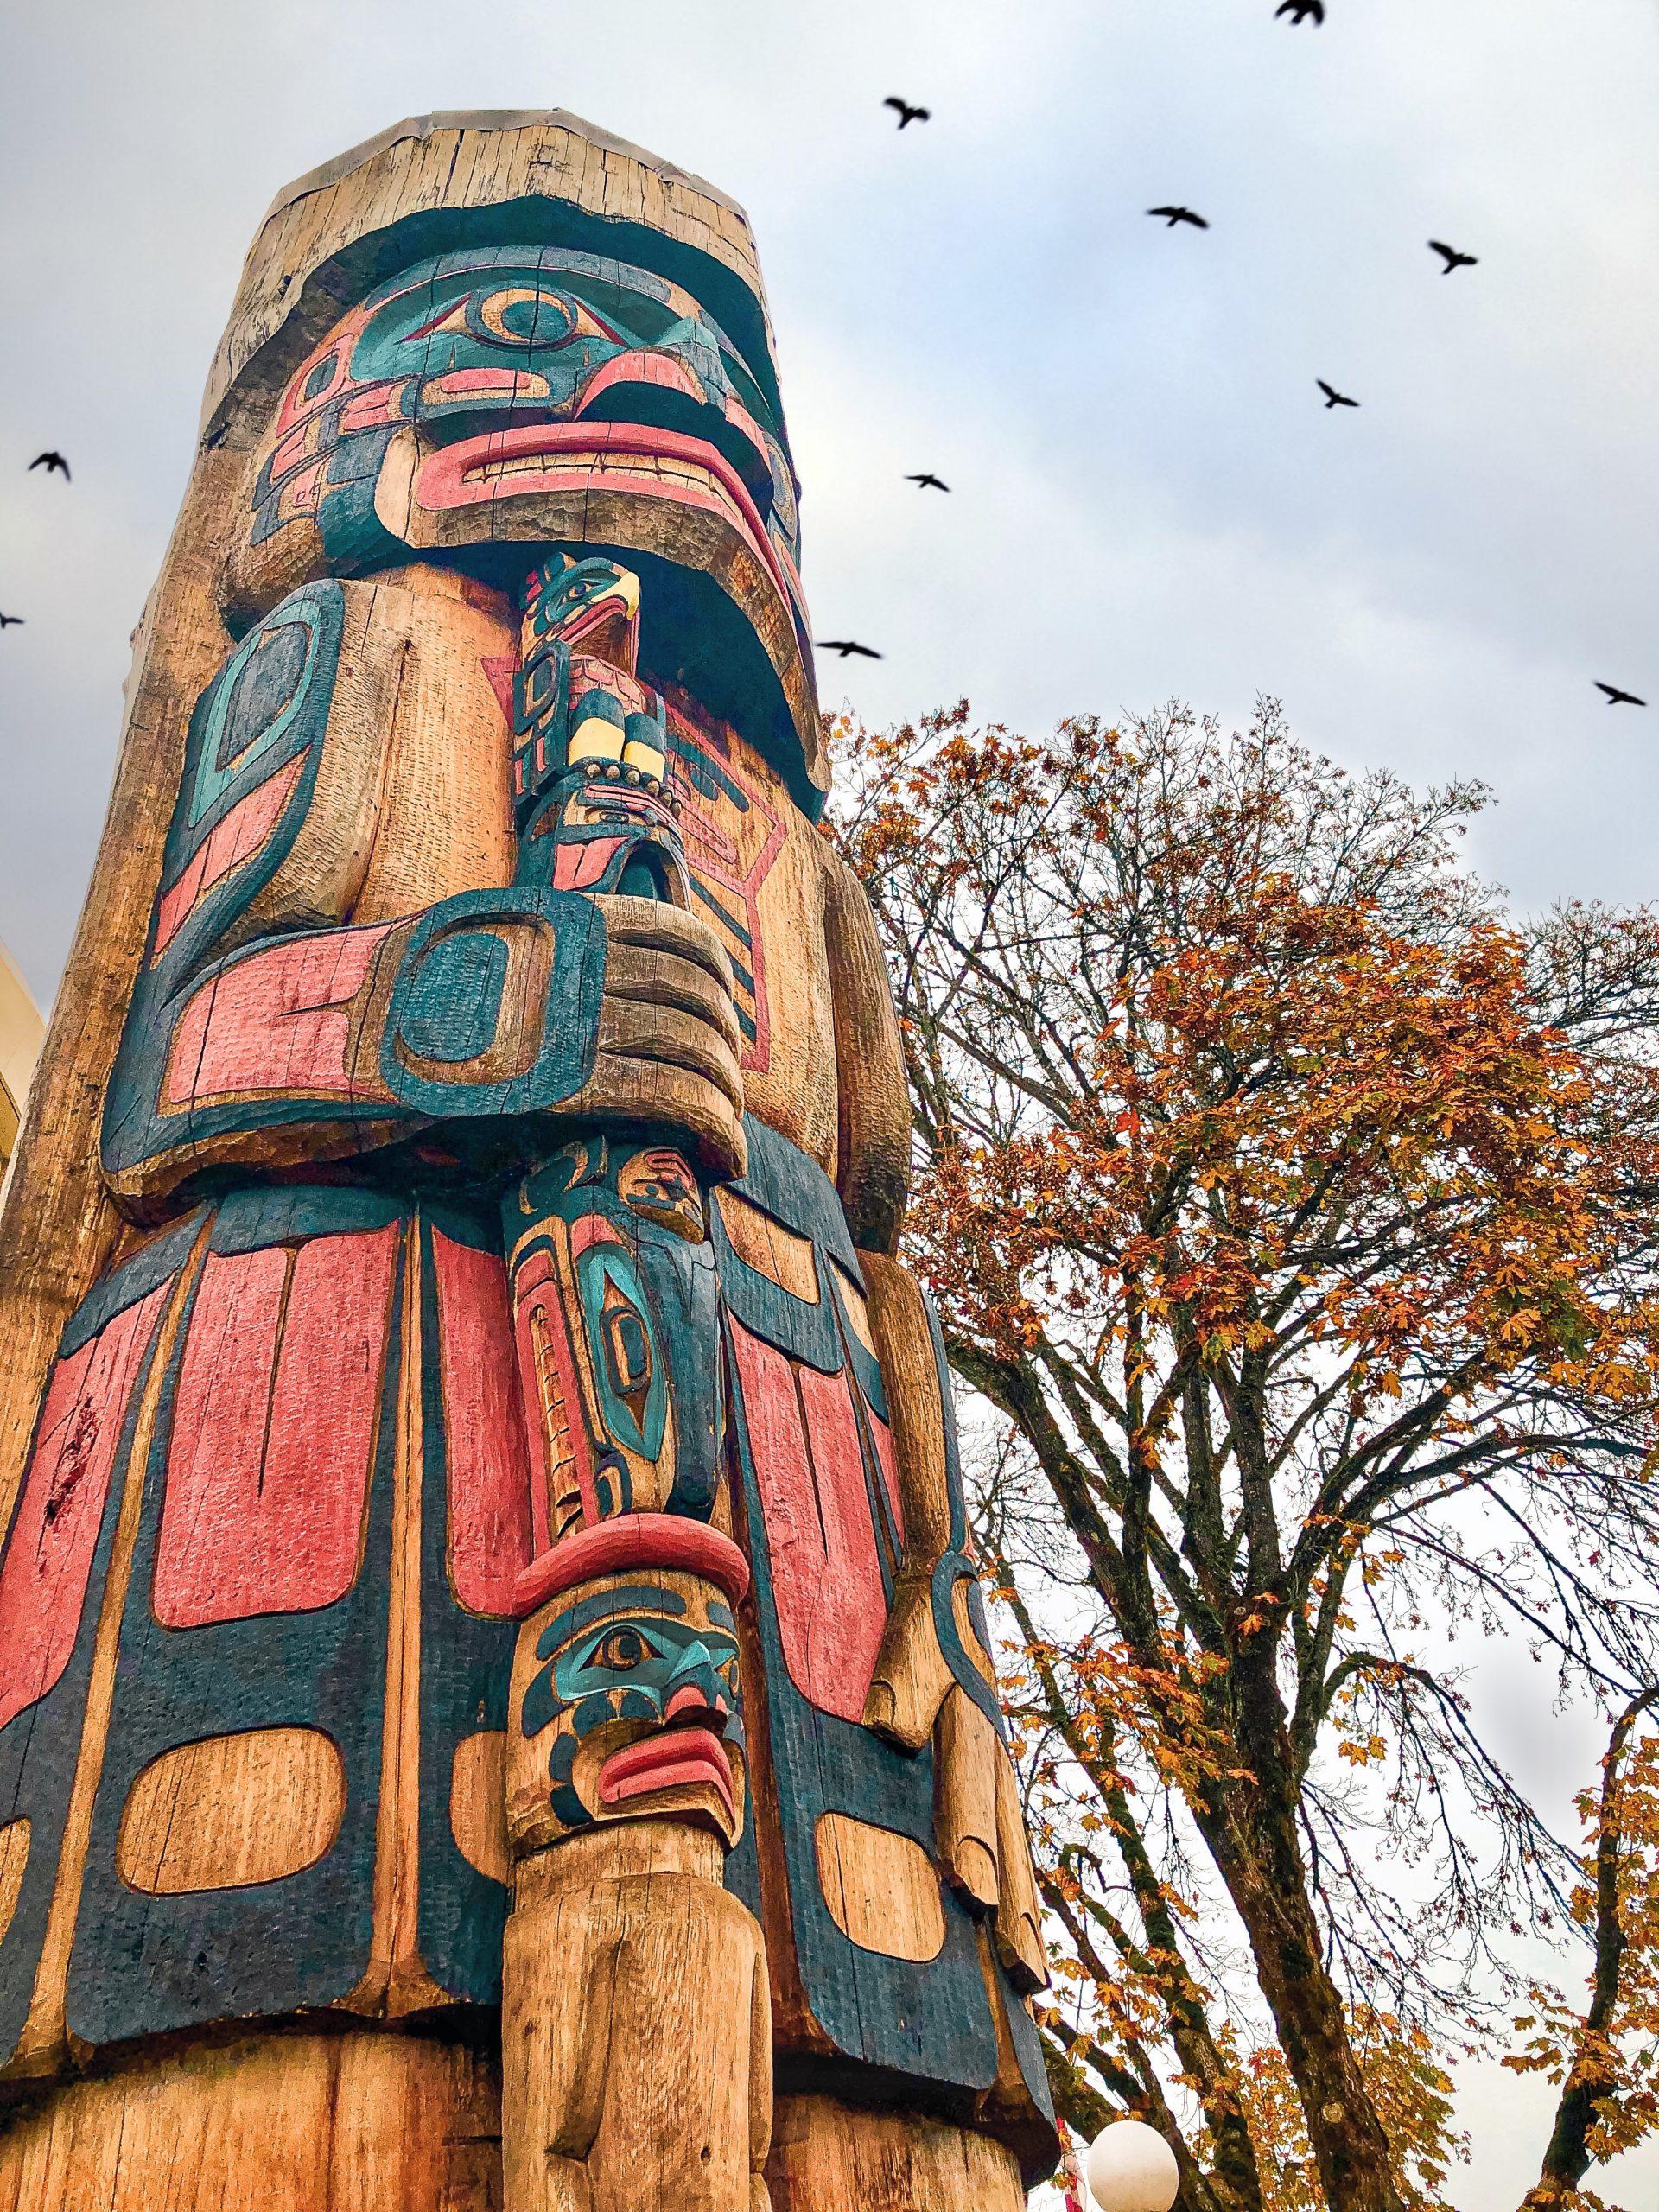 Pin on Pinterest - Totem Poles of British Columbia Canada, Duncan, BC